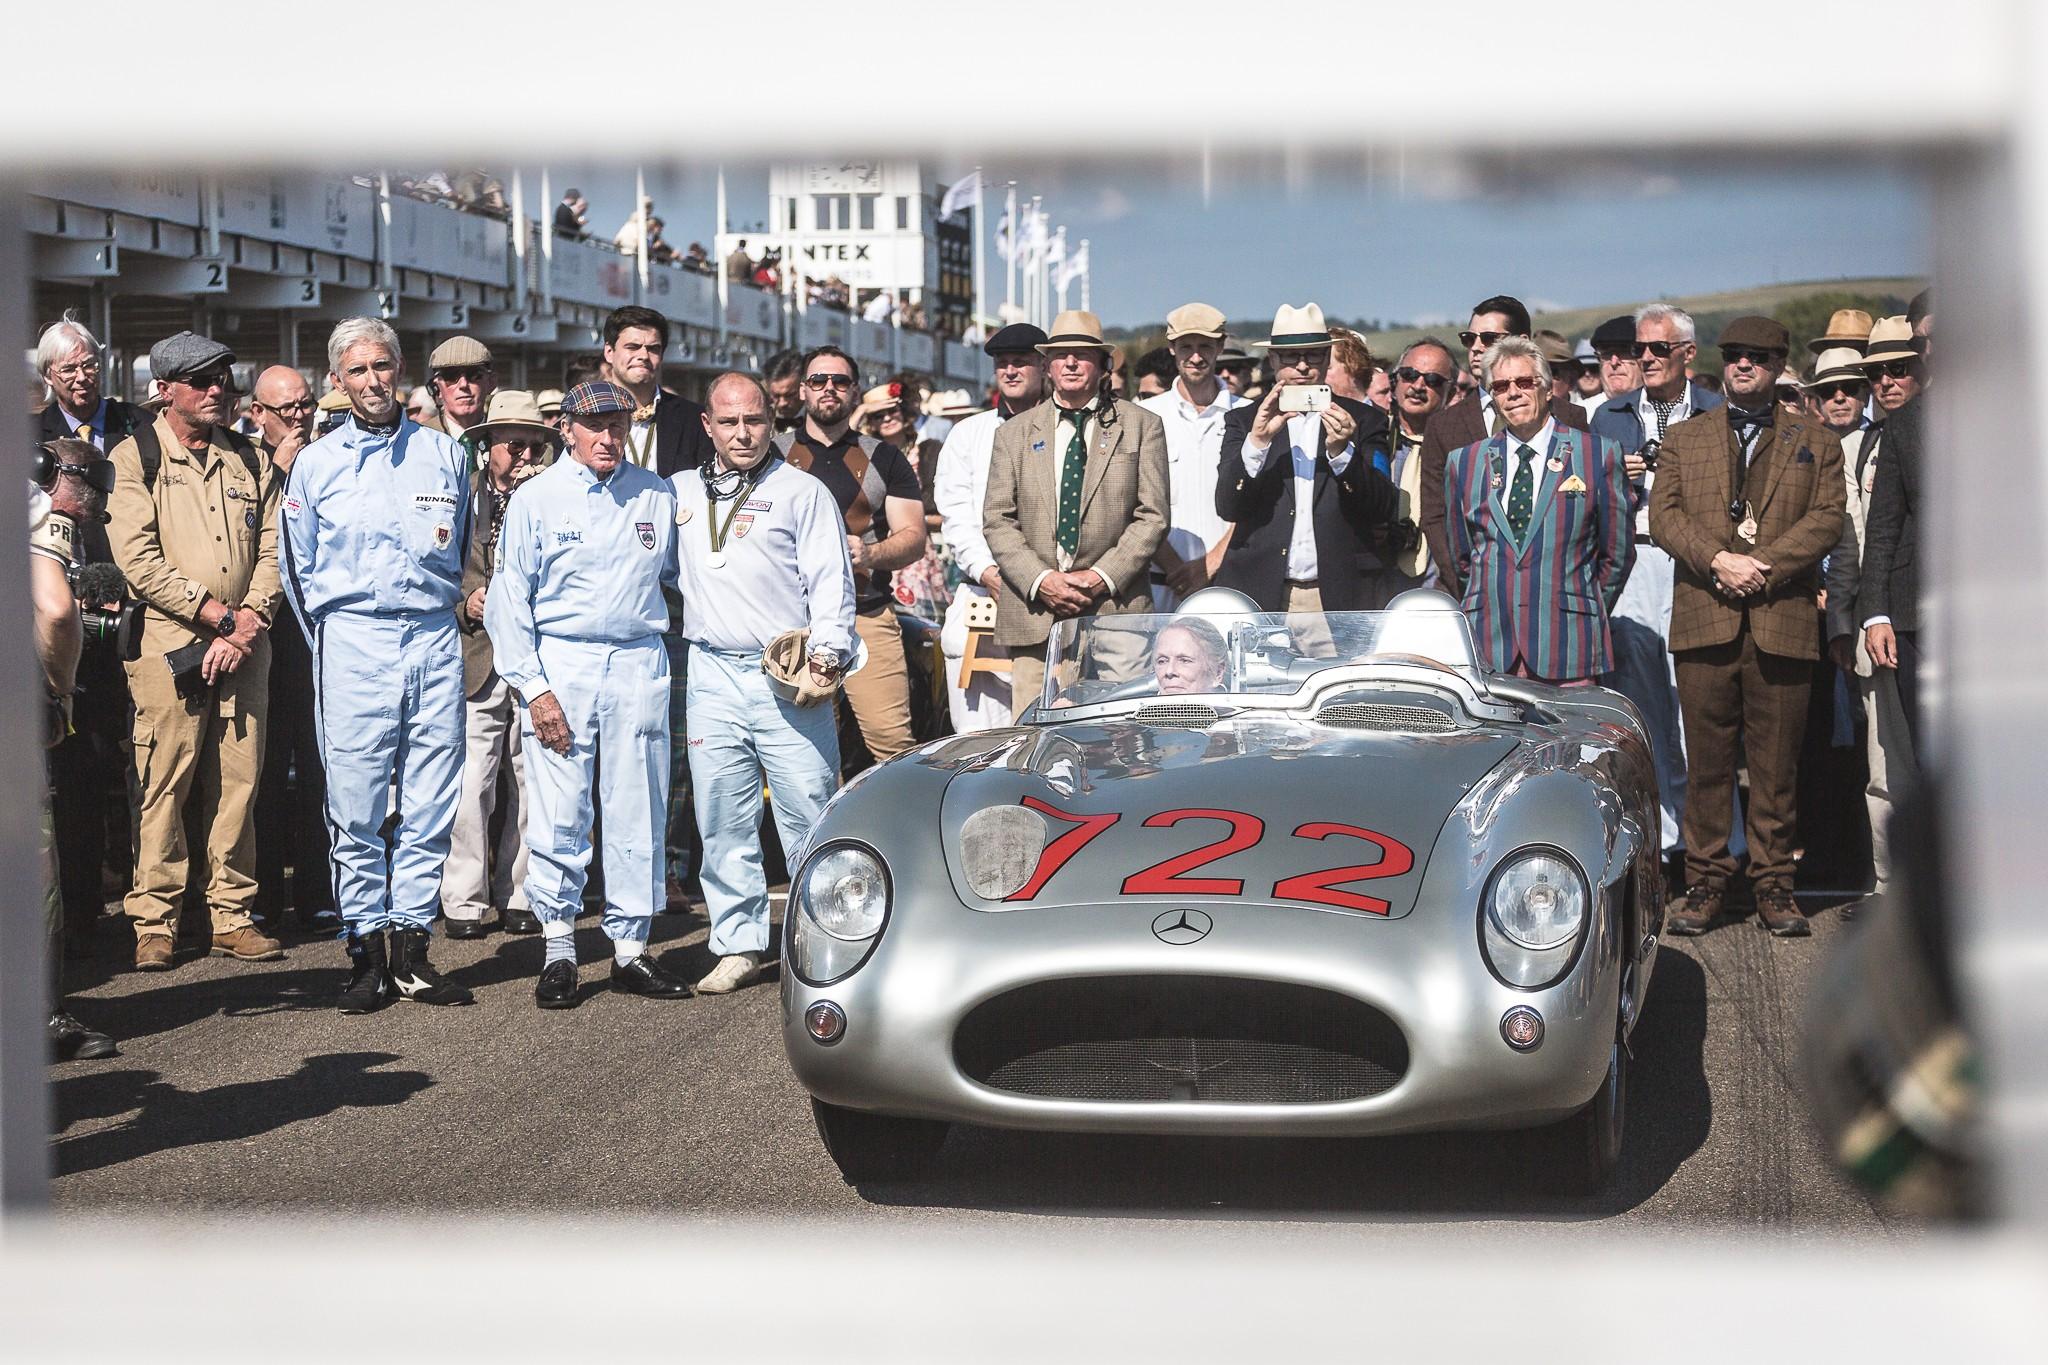 The legendary Sterling Moss Mille Miglia winning Mercedes 300SLR